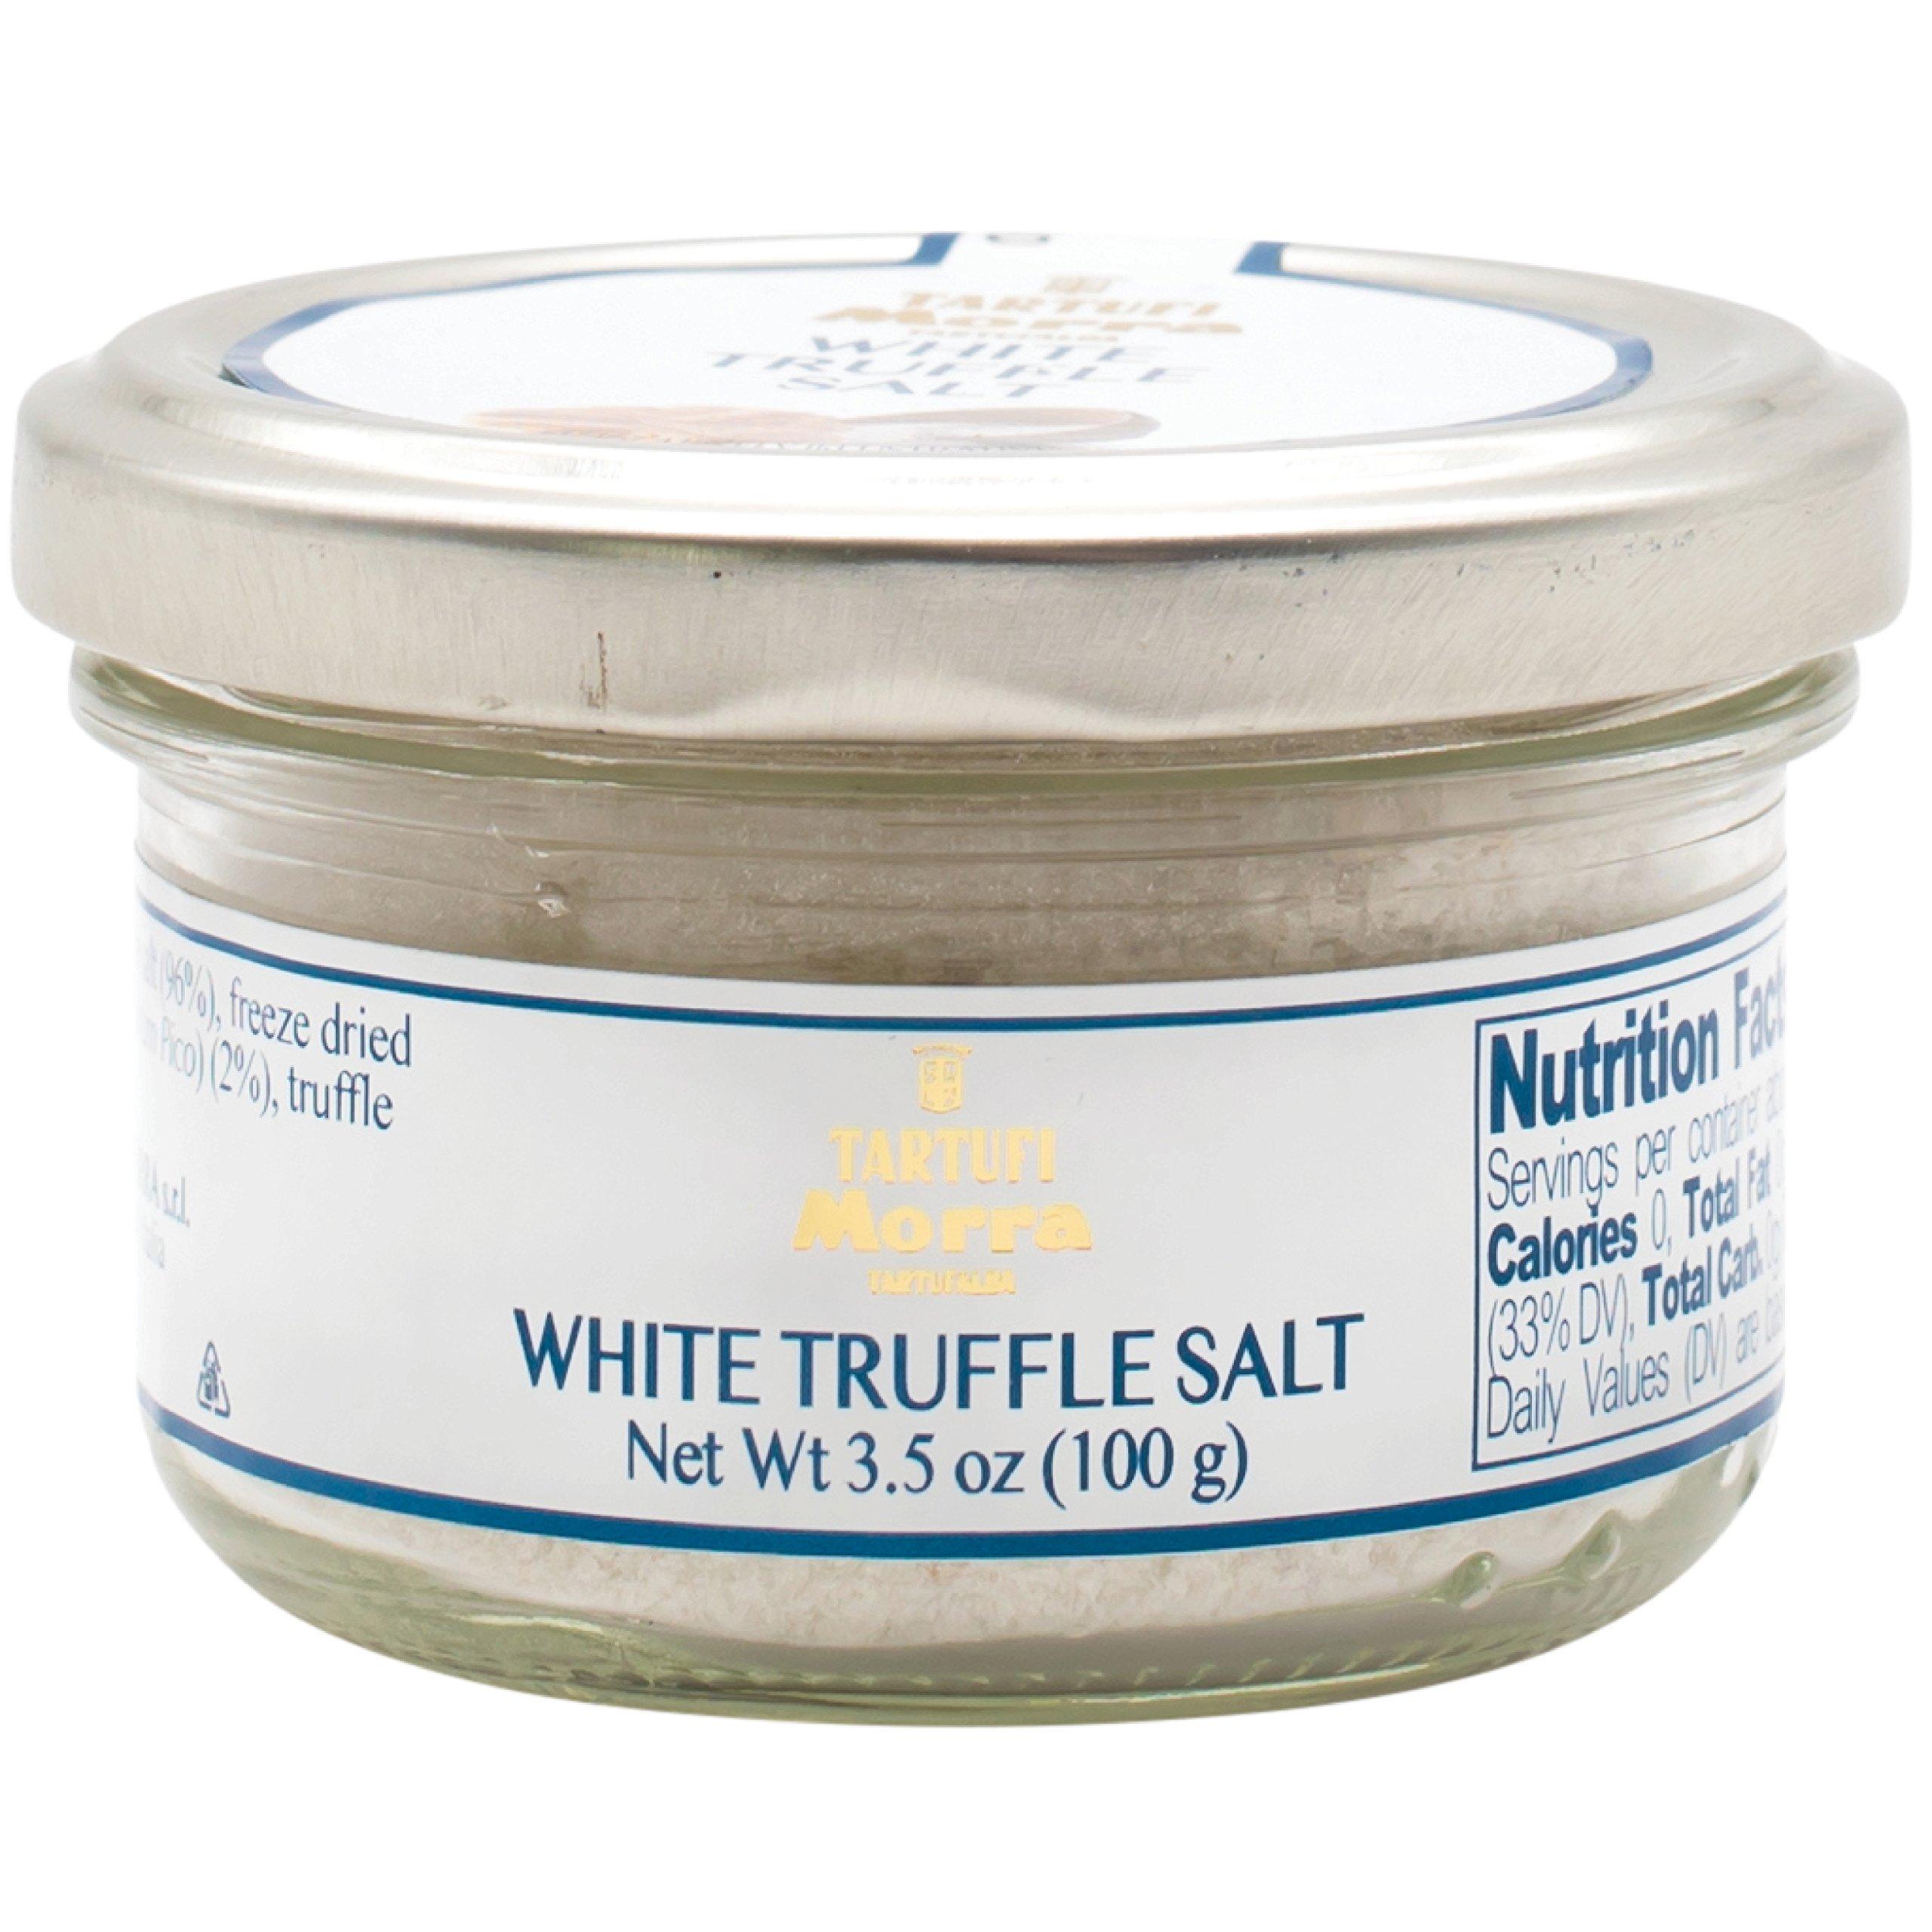 TARTUFALBA Italian White Truffle Salt - Tartufi MORRA from Alba - Sale di Tartufo Bianco - 3.5 oz - 100G